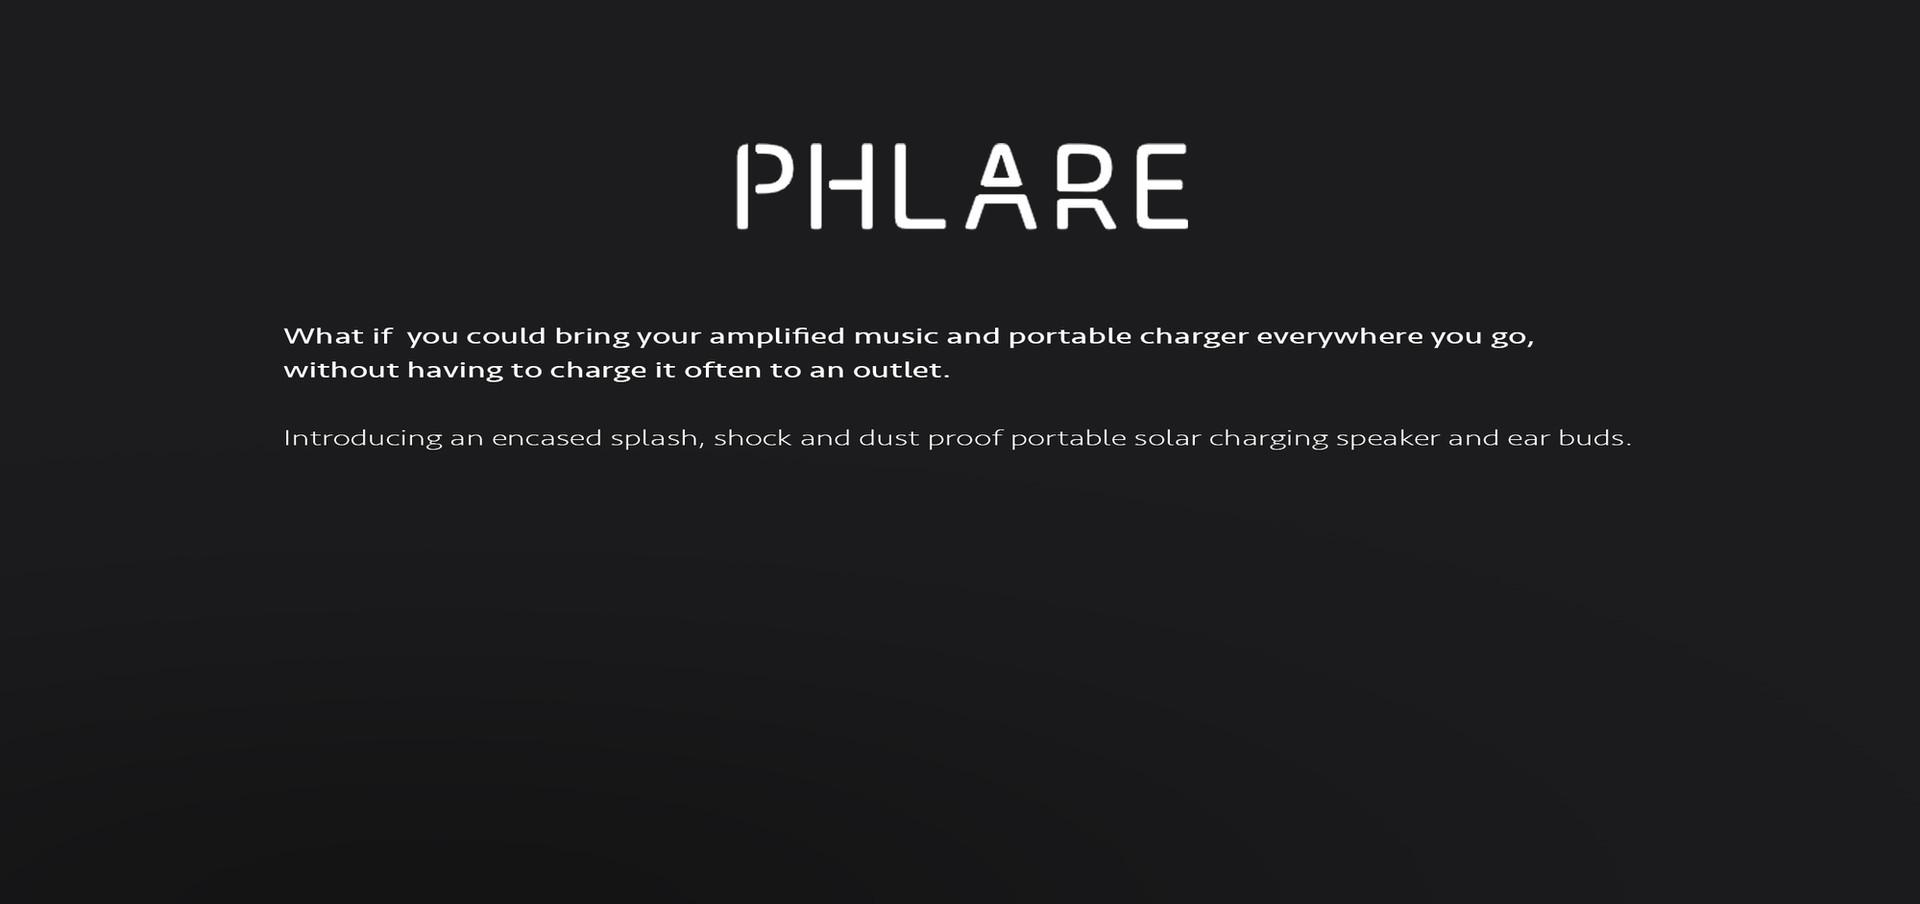 Phlare Intro statement.jpg